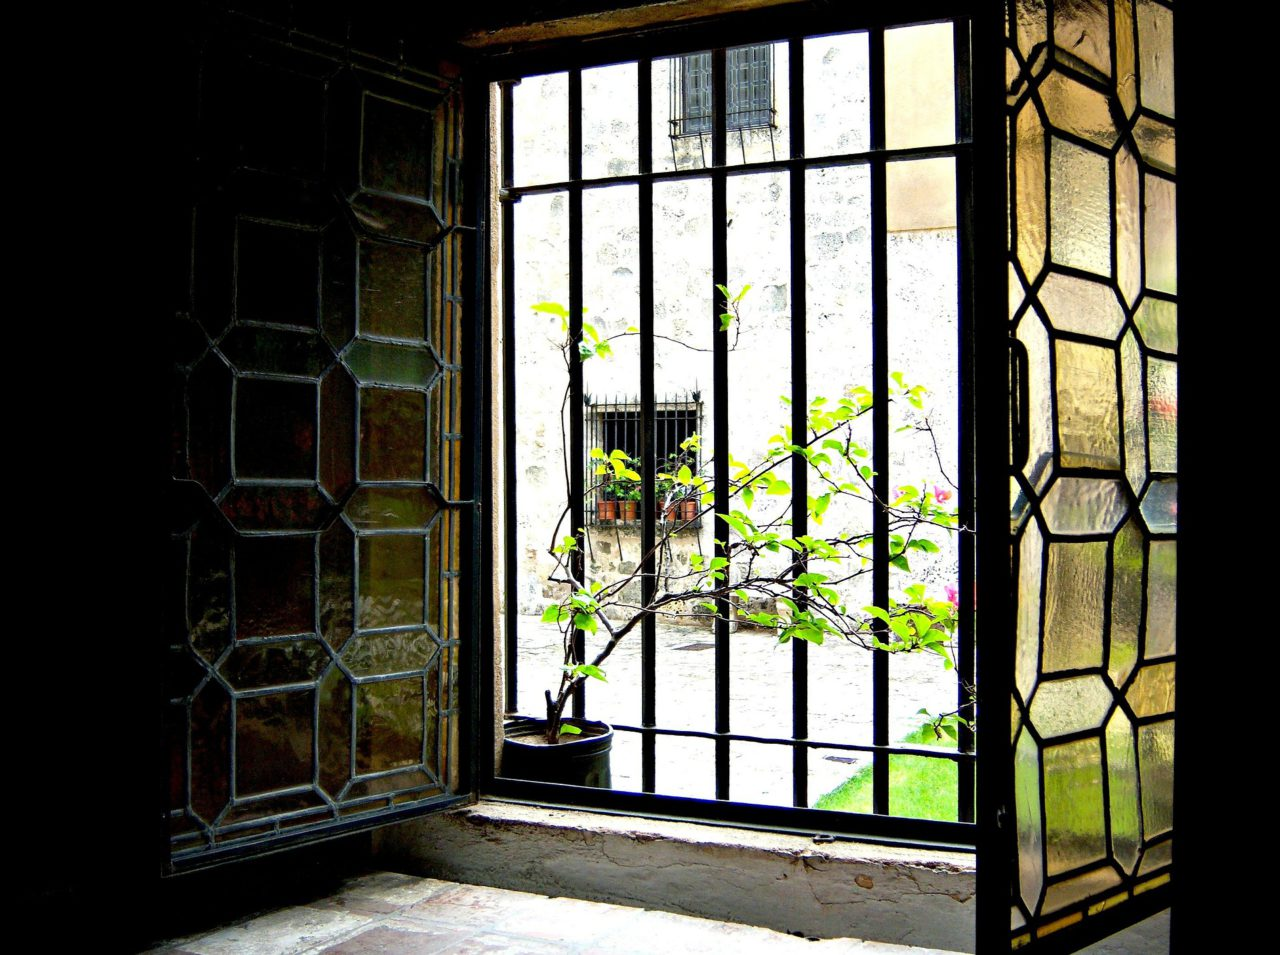 window-97020_1920-1280x955.jpg